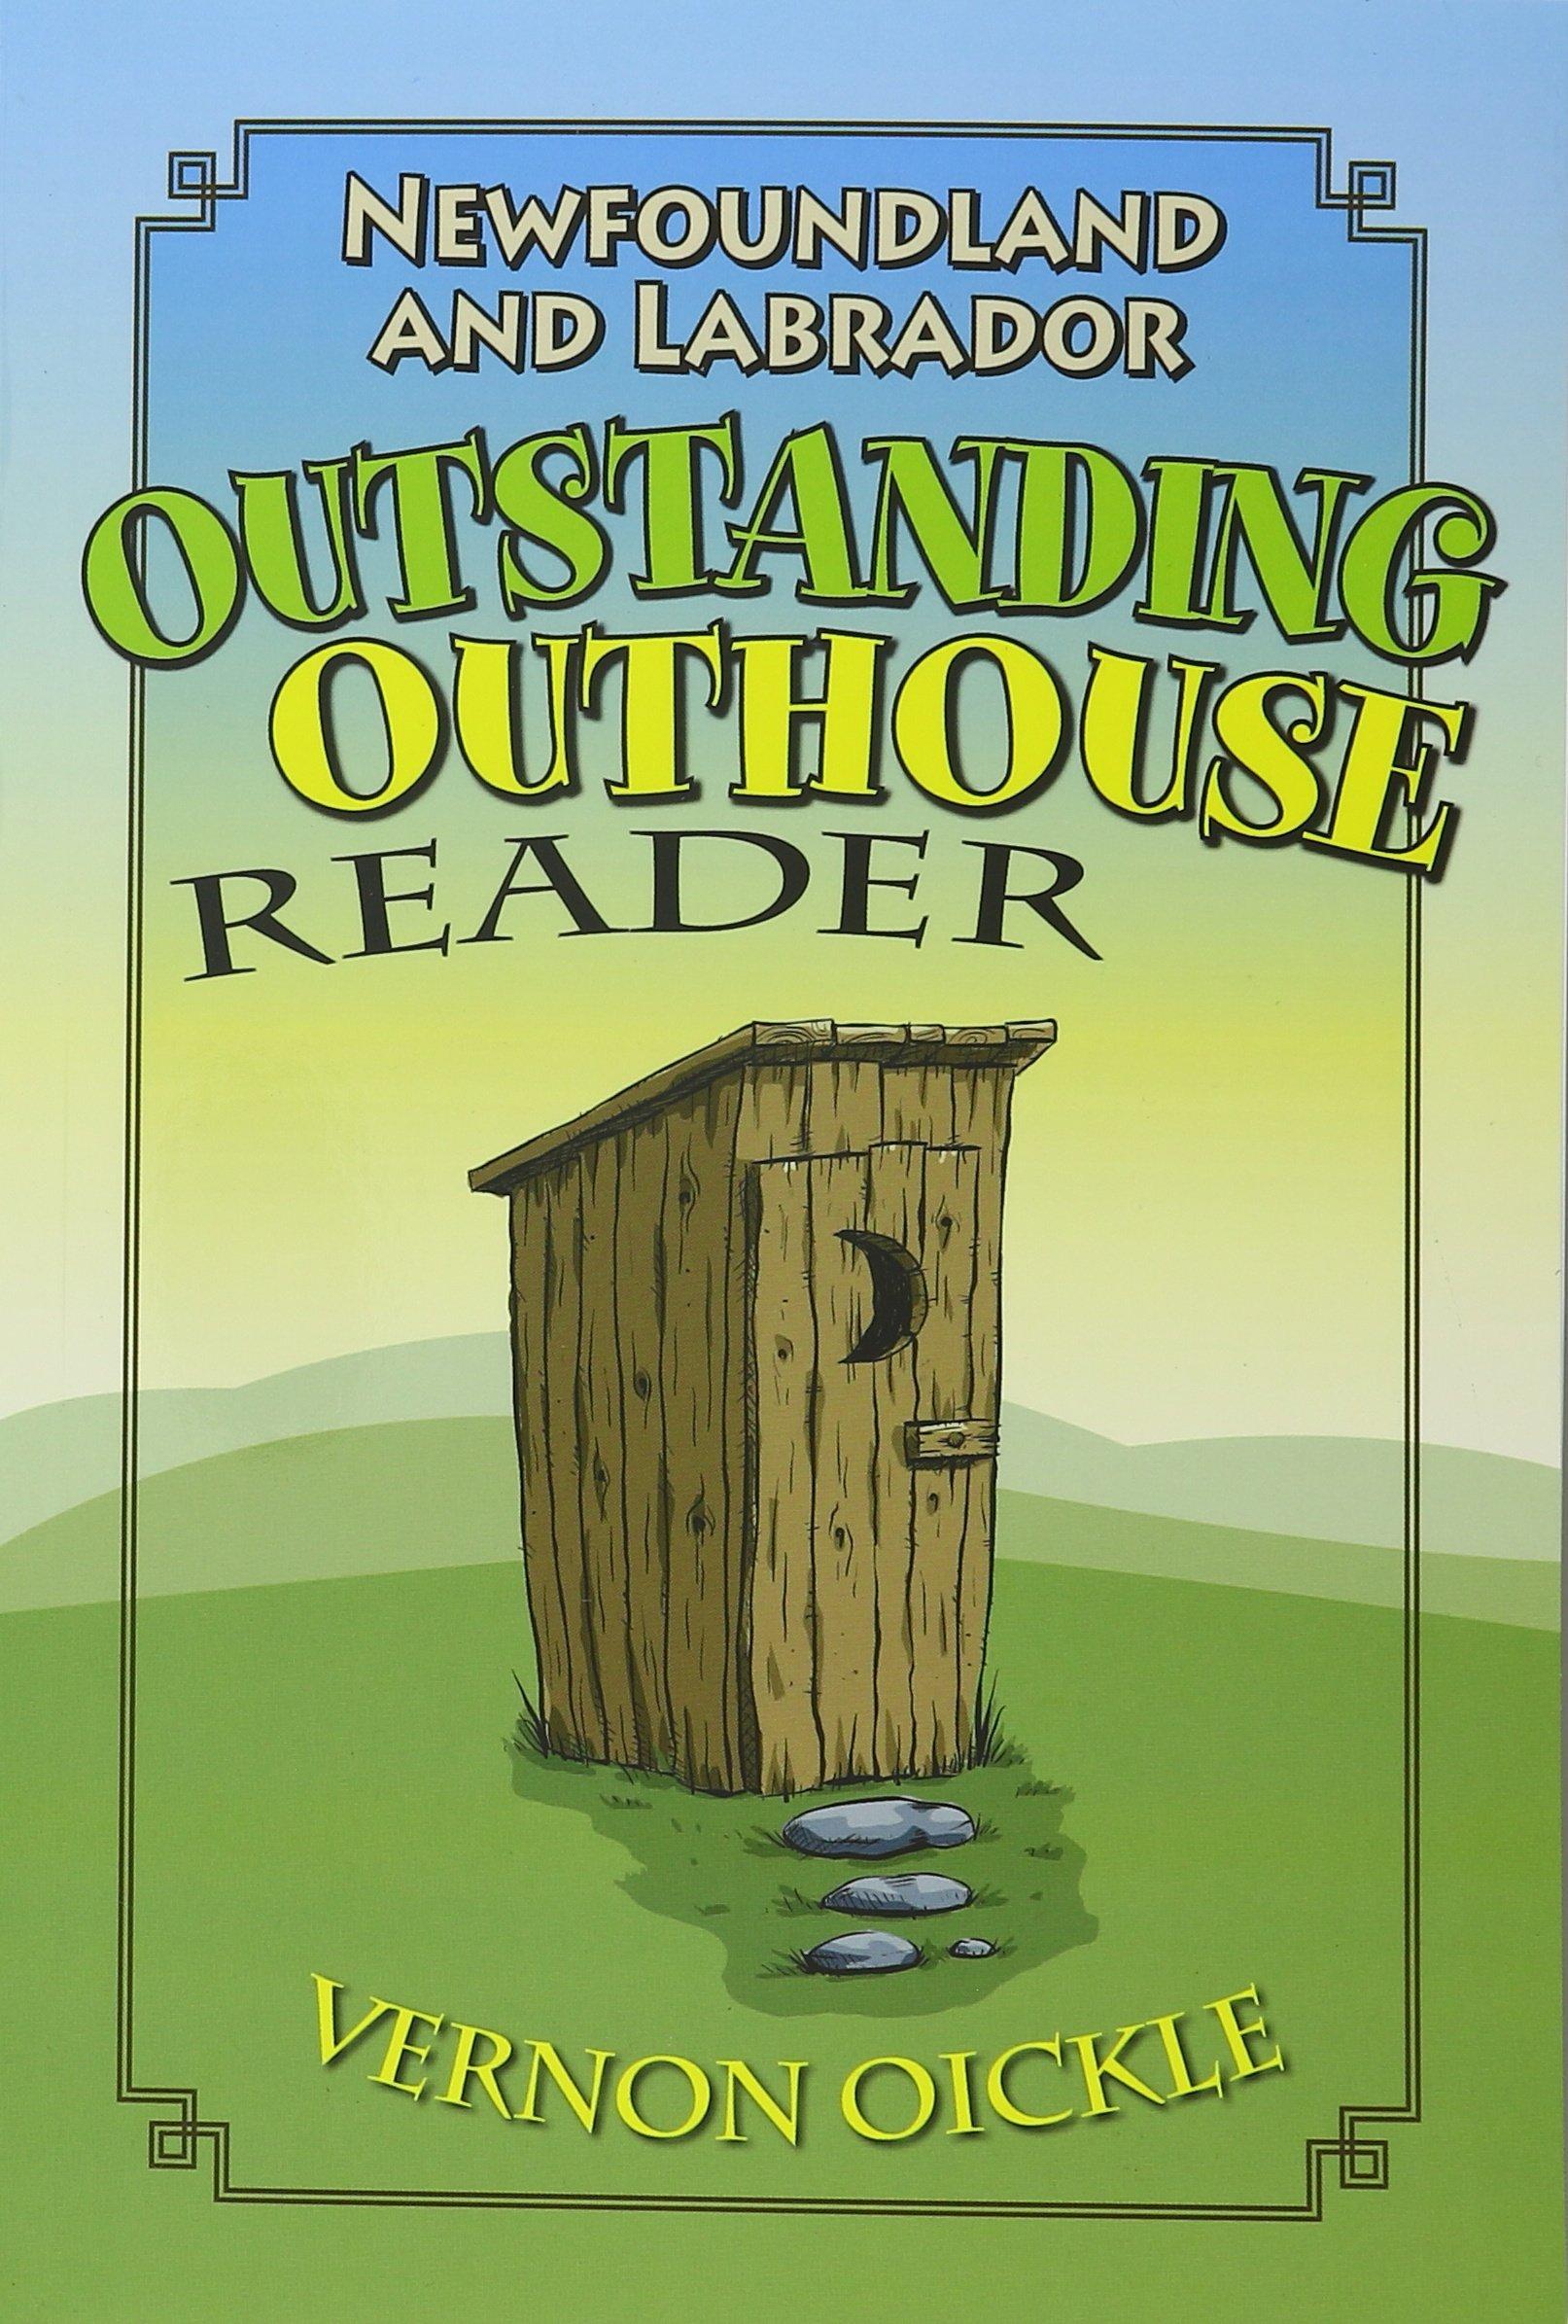 Newfoundland and Labrador Outrageous Outhouse Reader